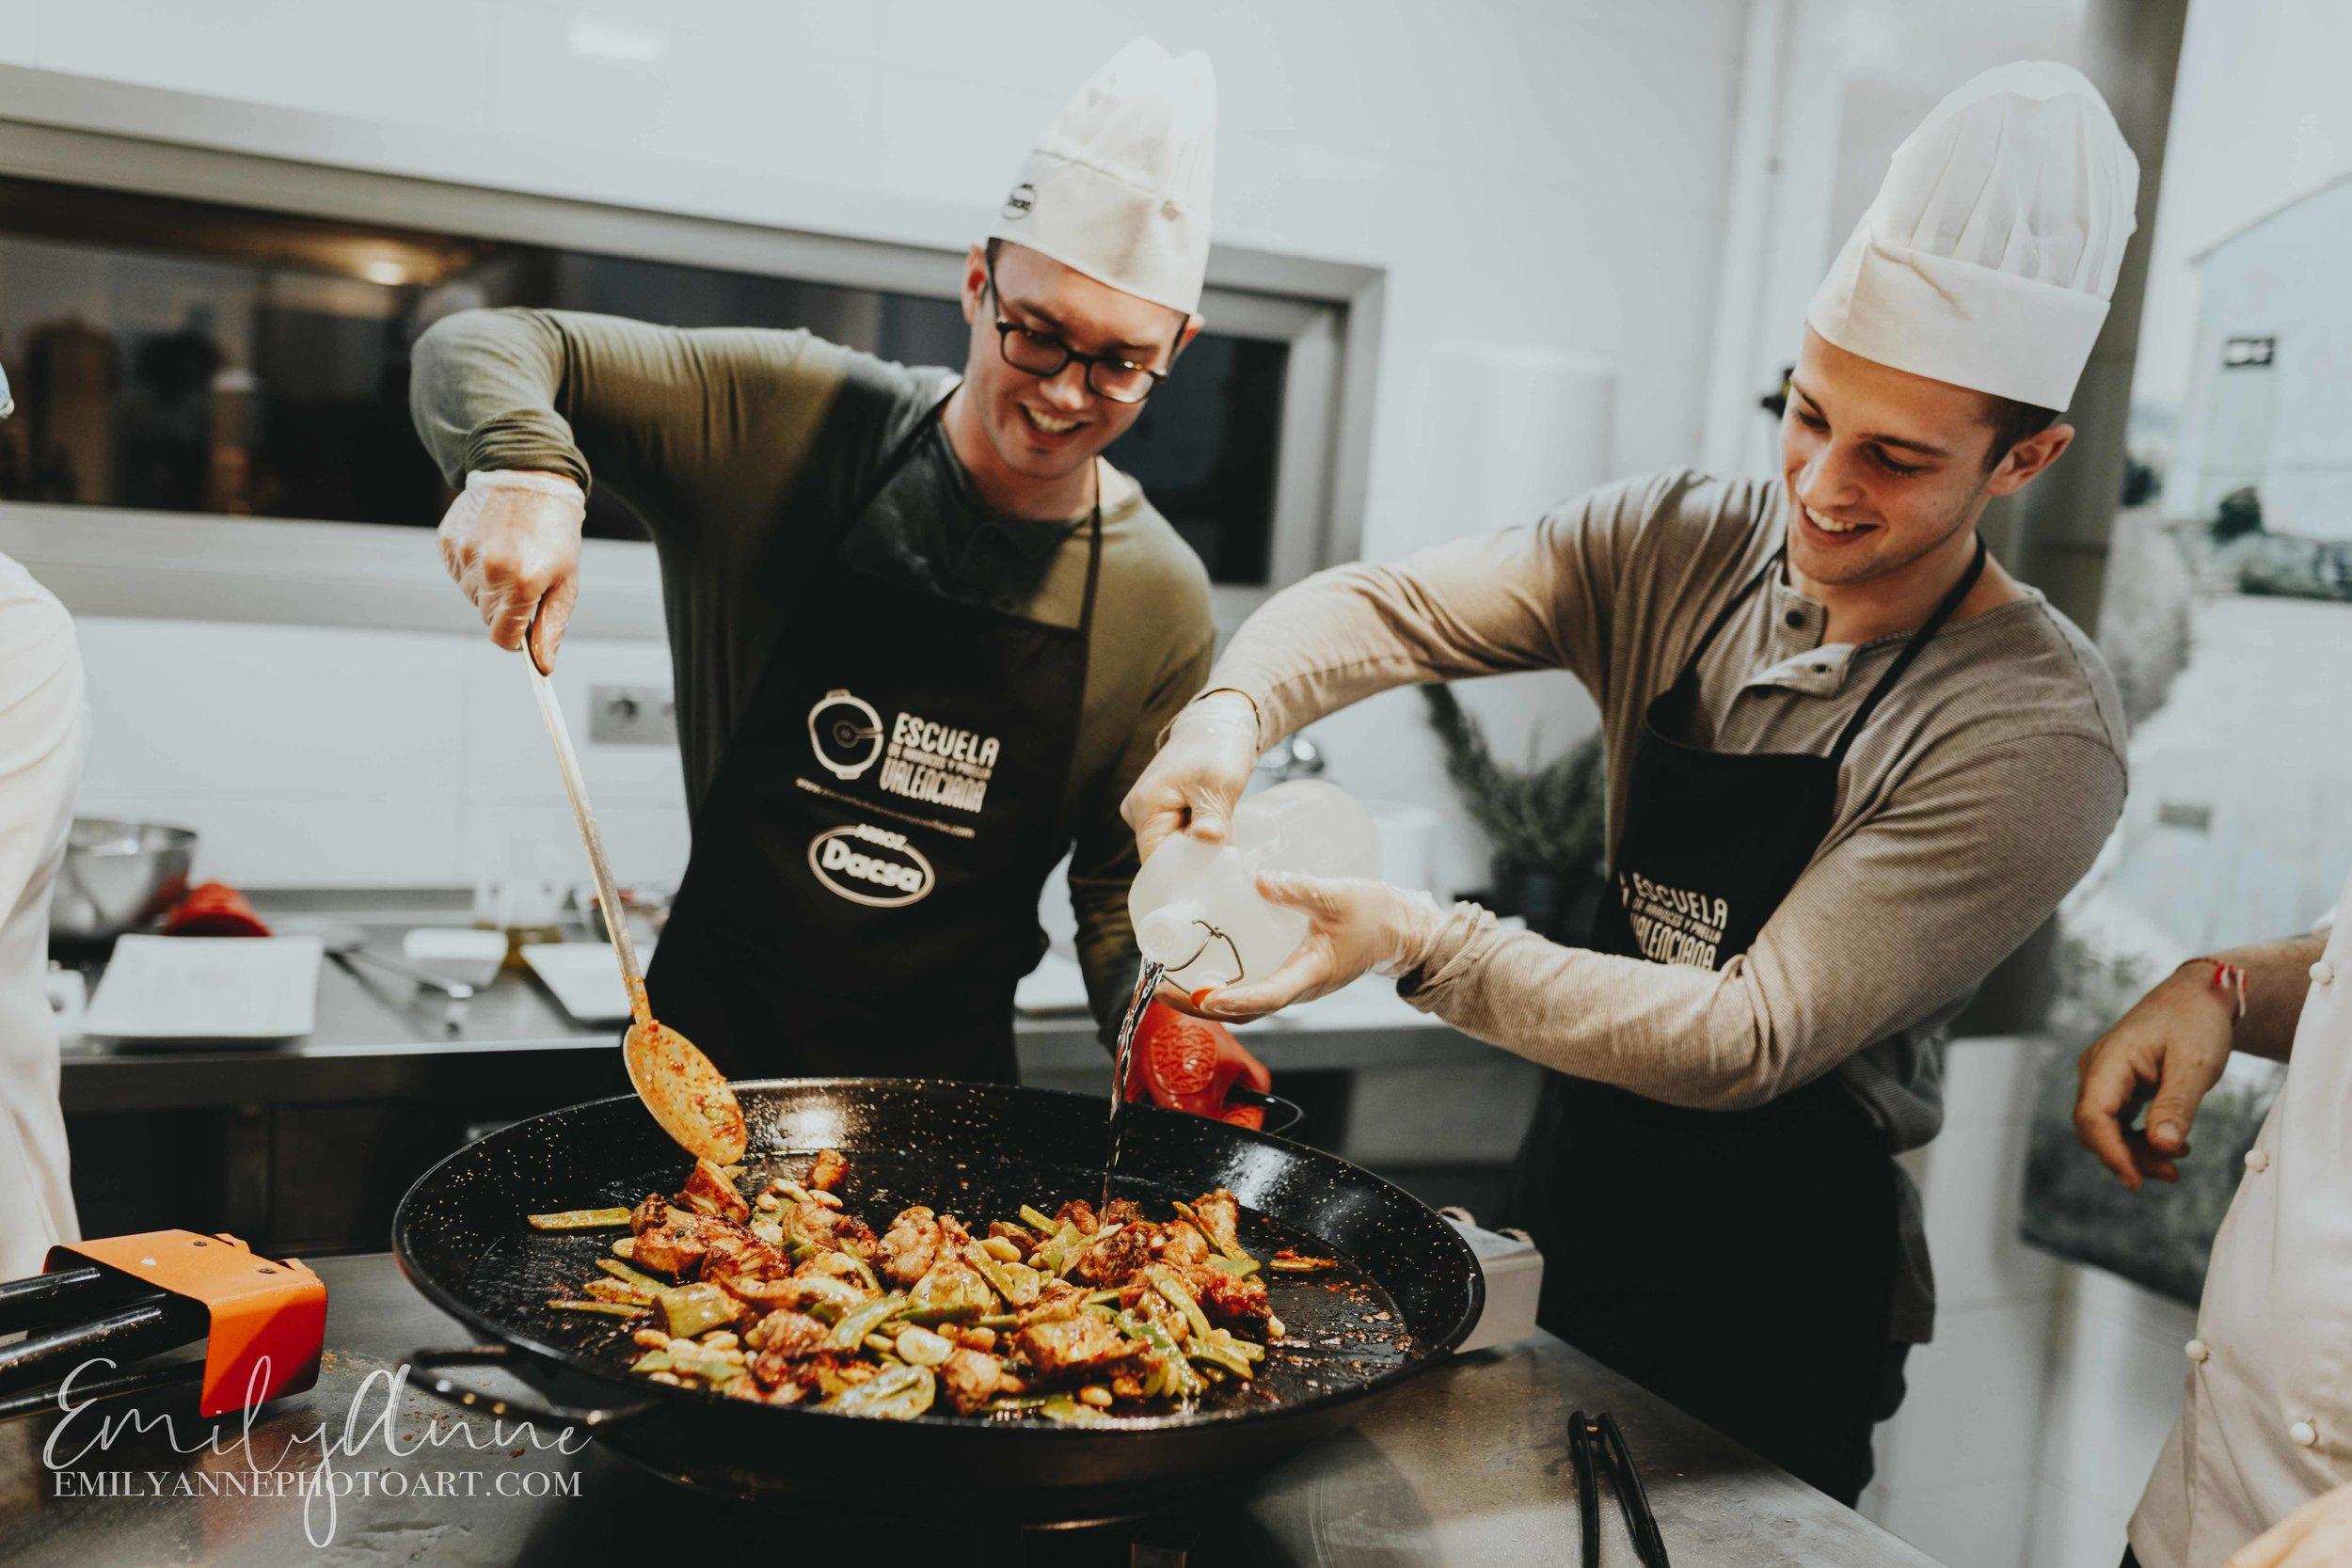 cooking paella school of paella in valencia Spain emily anne photo art